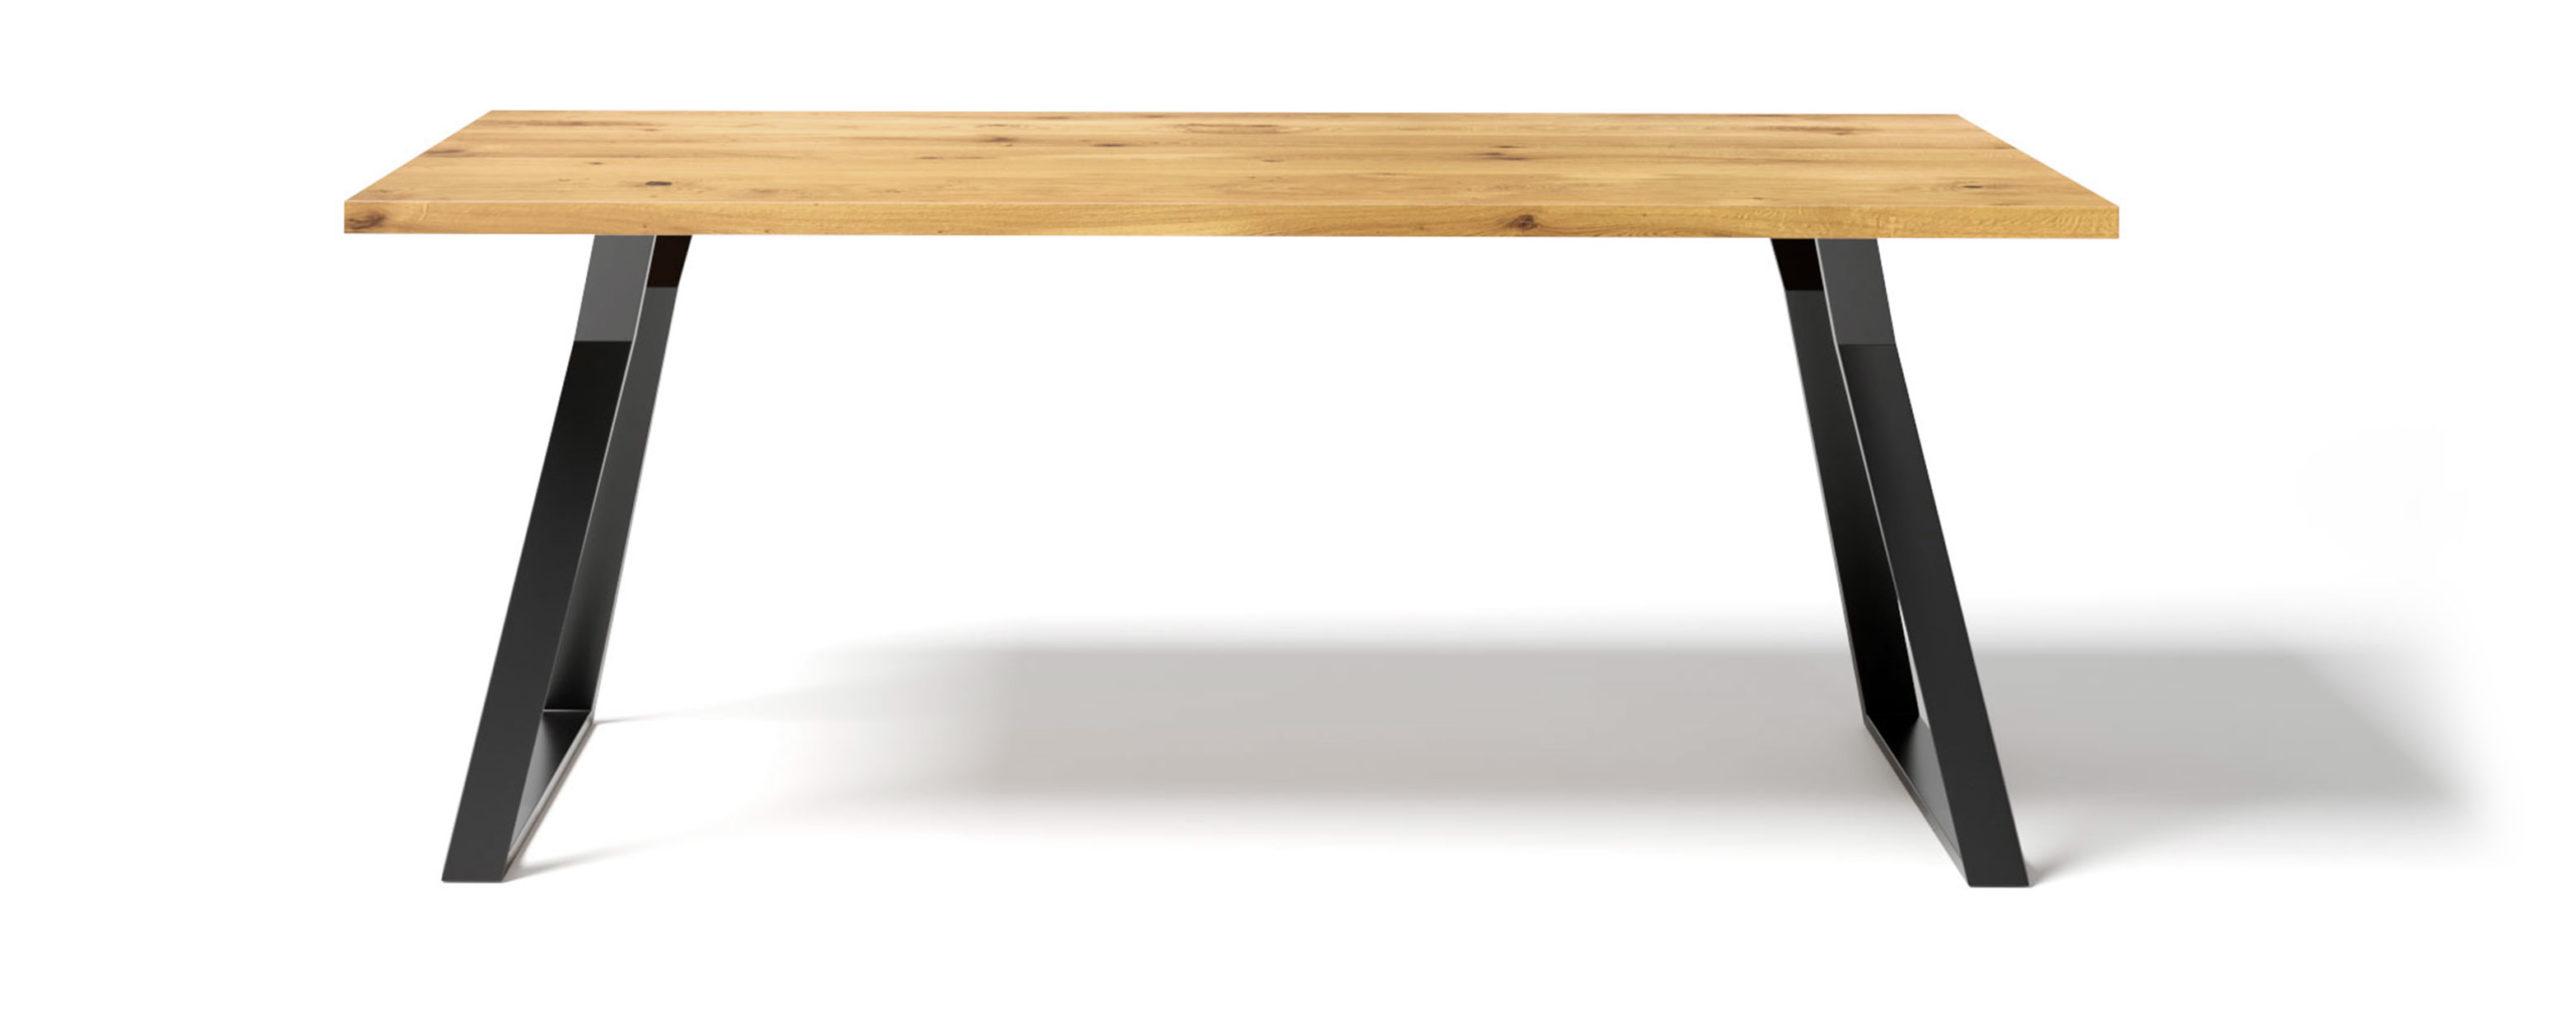 Stół Alahis - Adwood